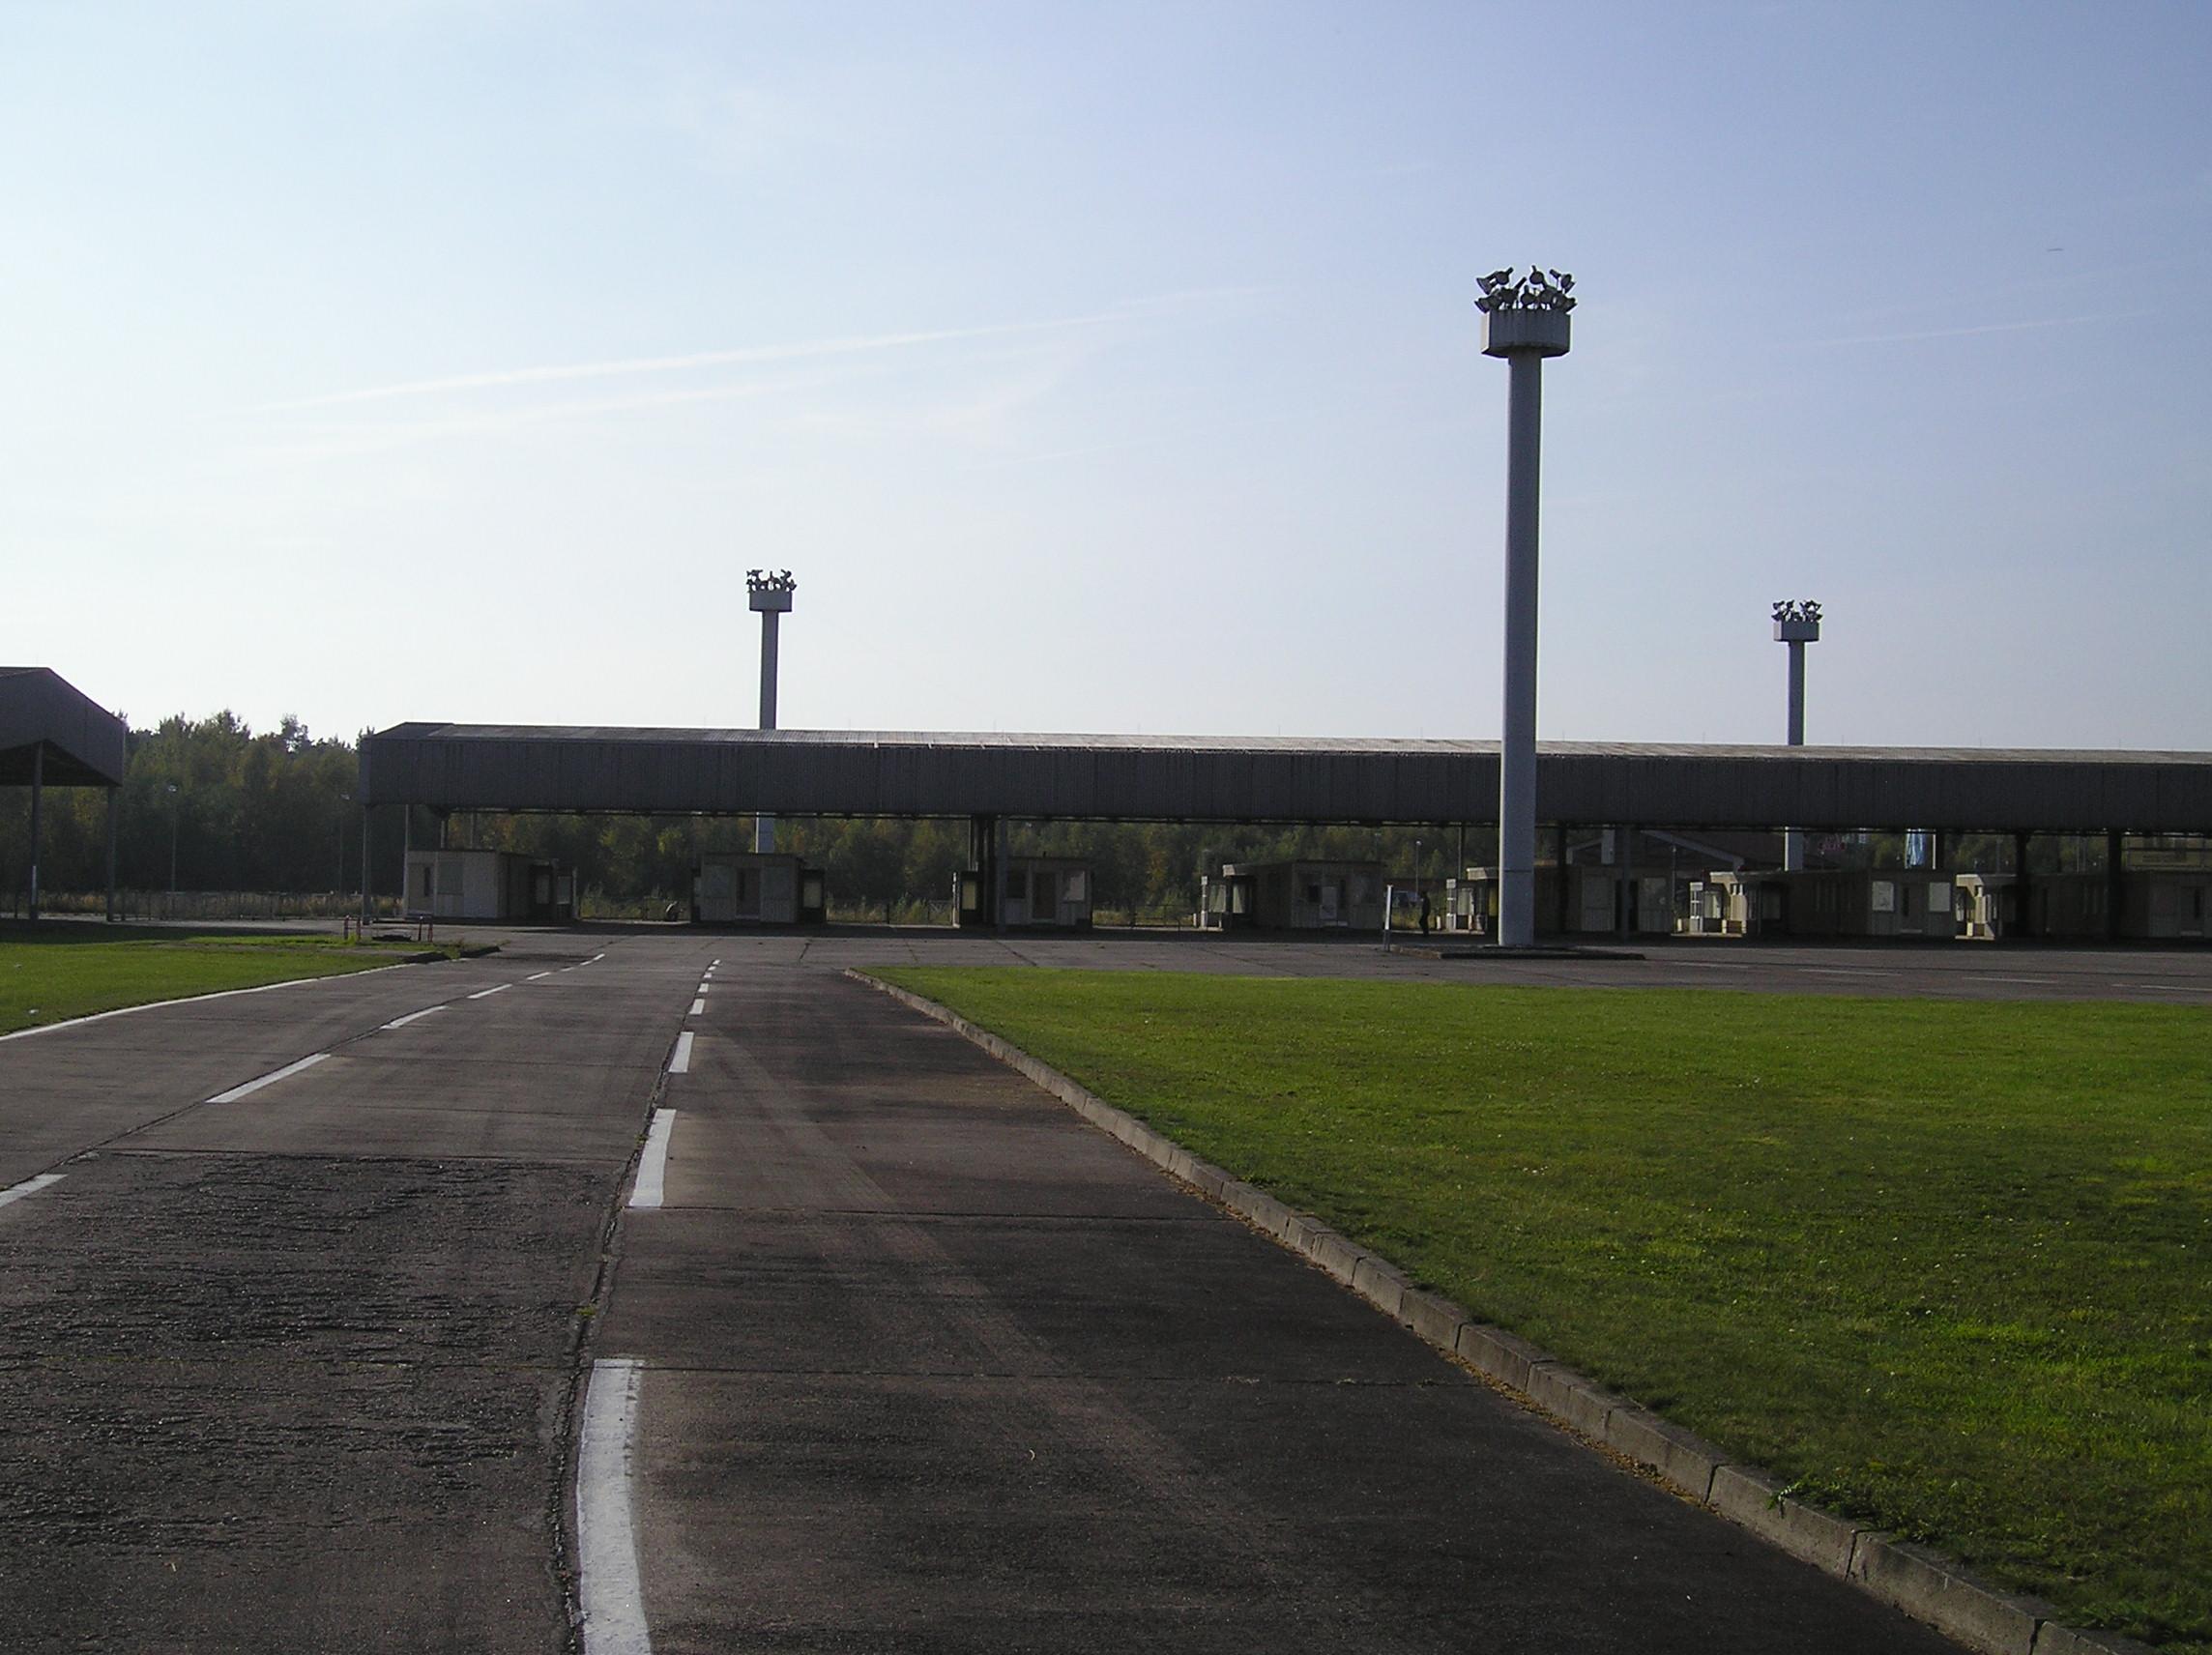 Grensovergang-helmstedt-marienborn-paspoortcontrole-personenautos-04